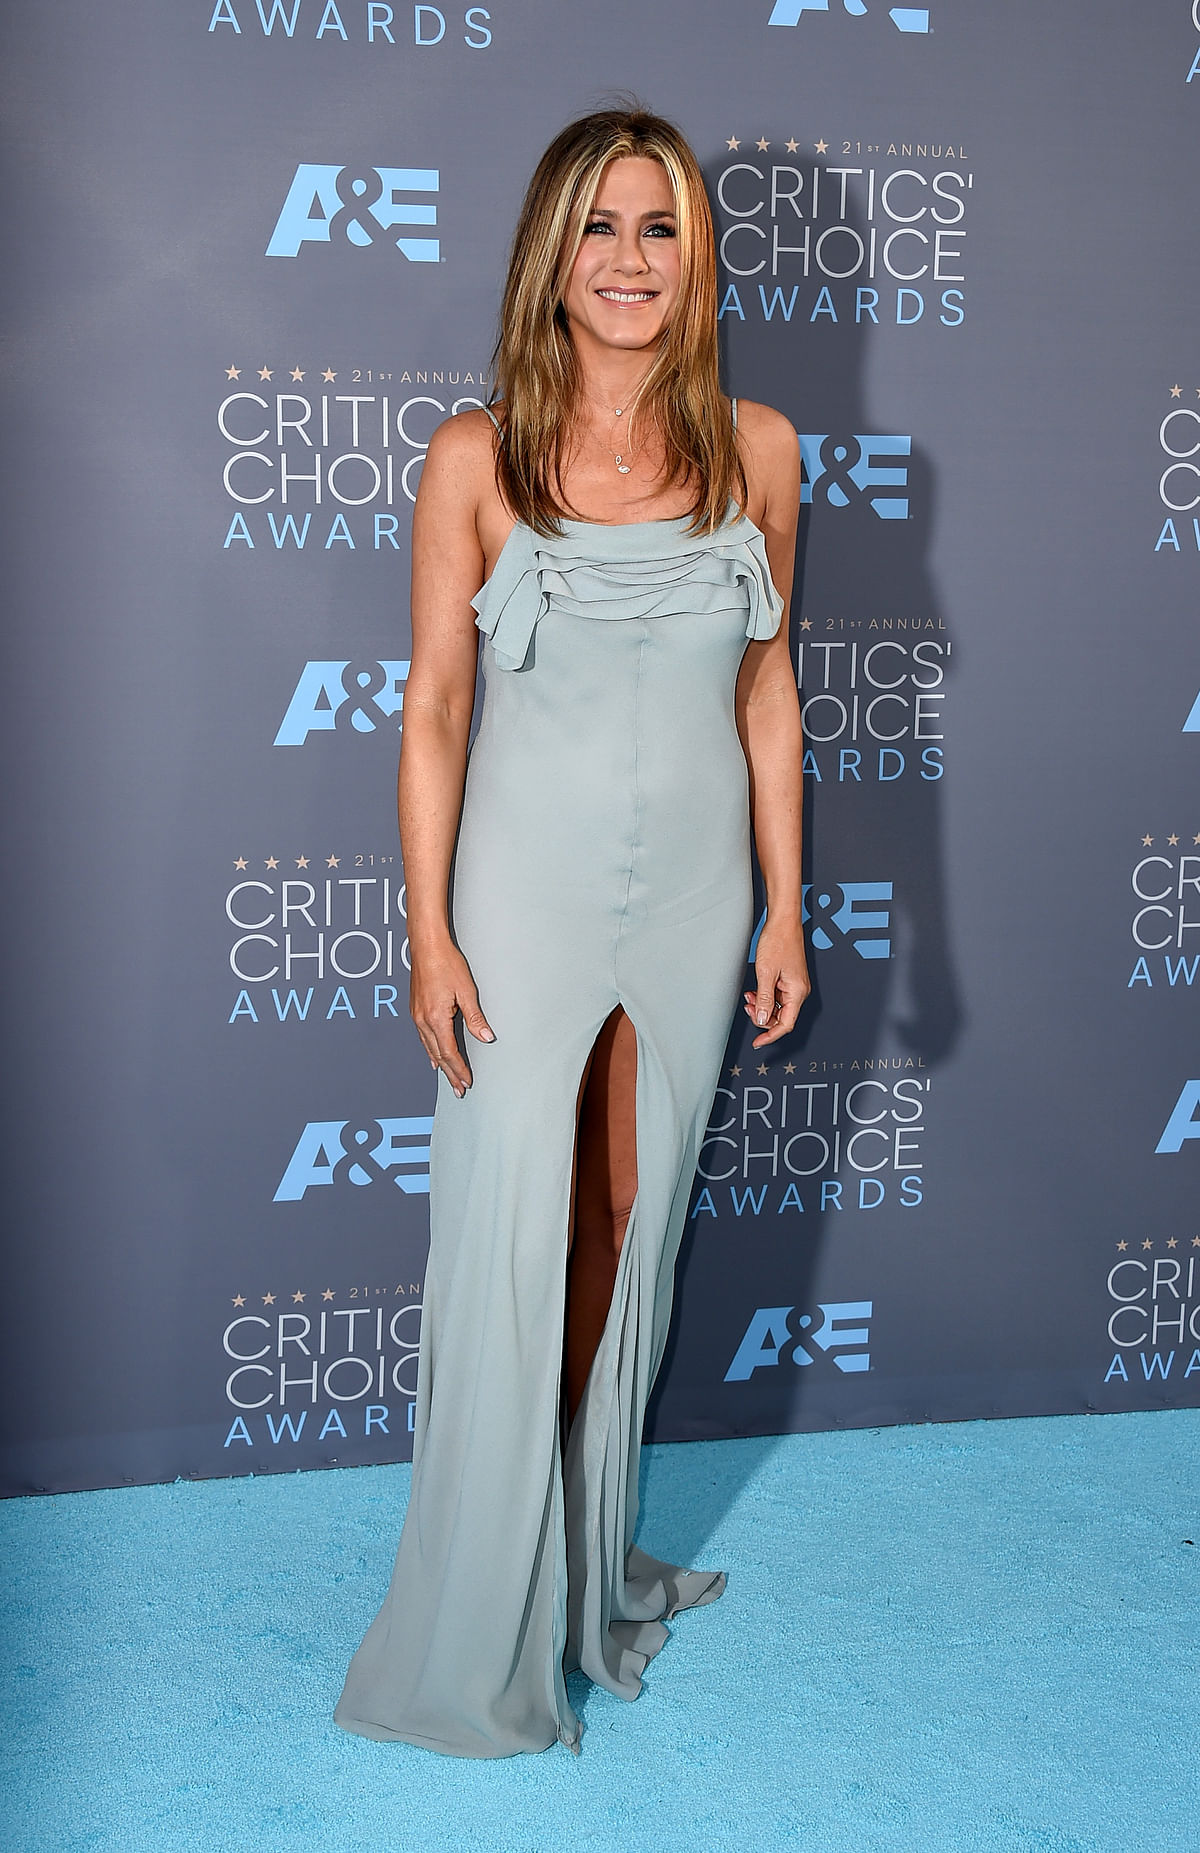 File photo of Jennifer Aniston at the 21st annual Critics' Choice Awards. (Photo: AP)